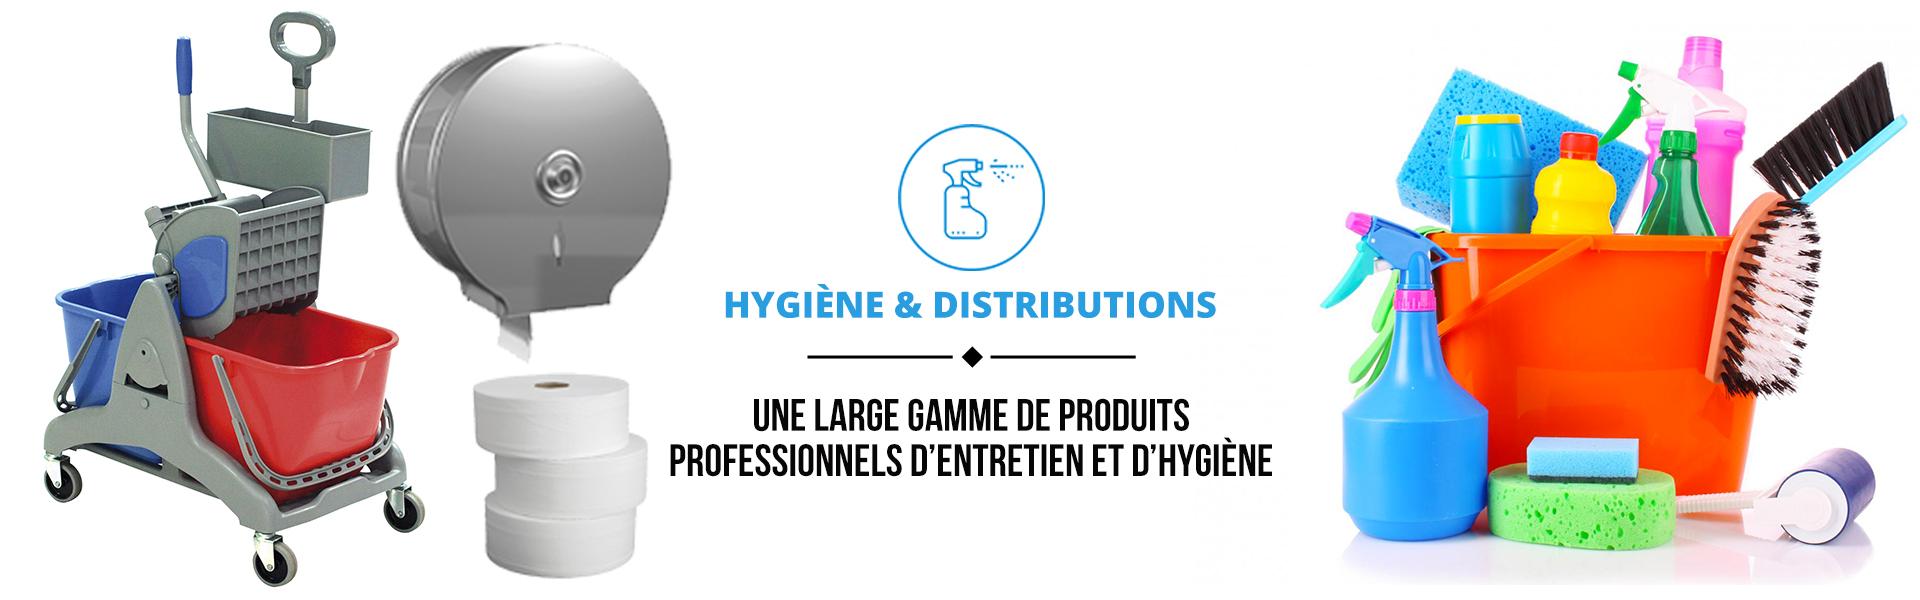 Hygiène & Distributions